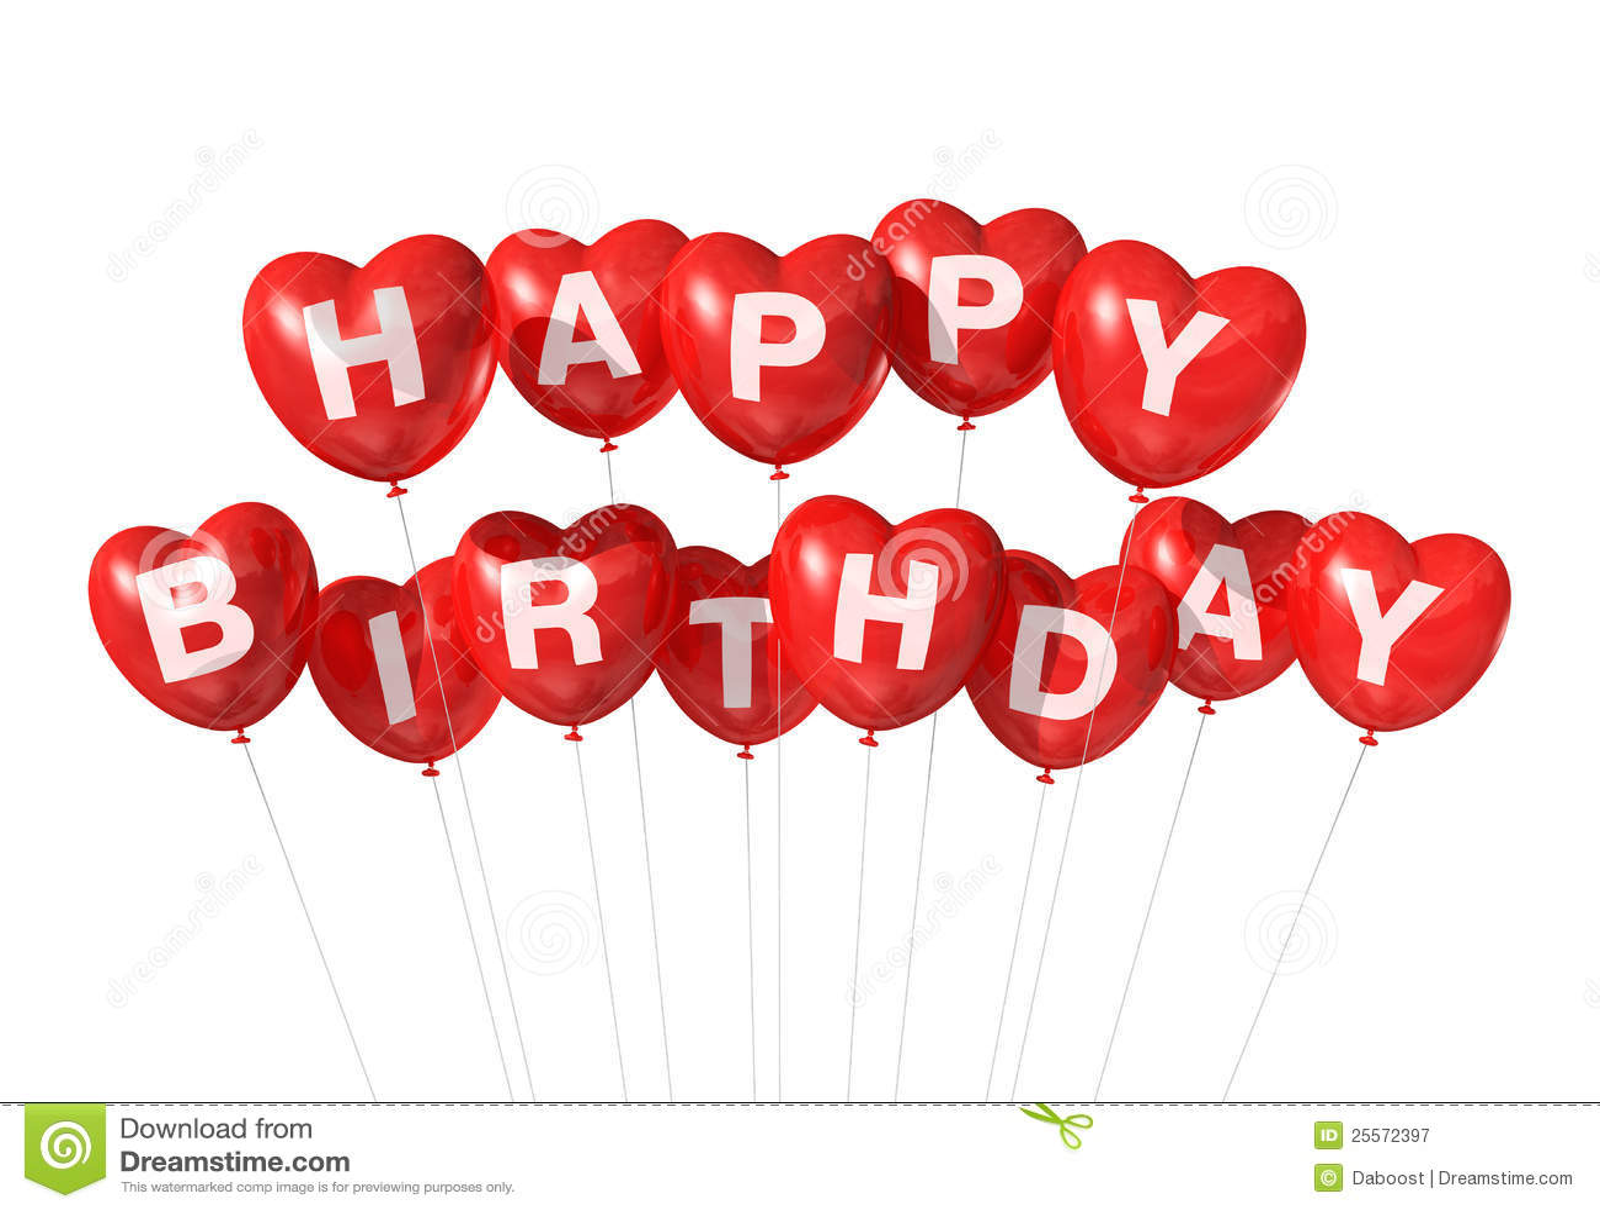 Red Happy Birthday Heart Shape Balloons Royalty Free Stock Photography ...